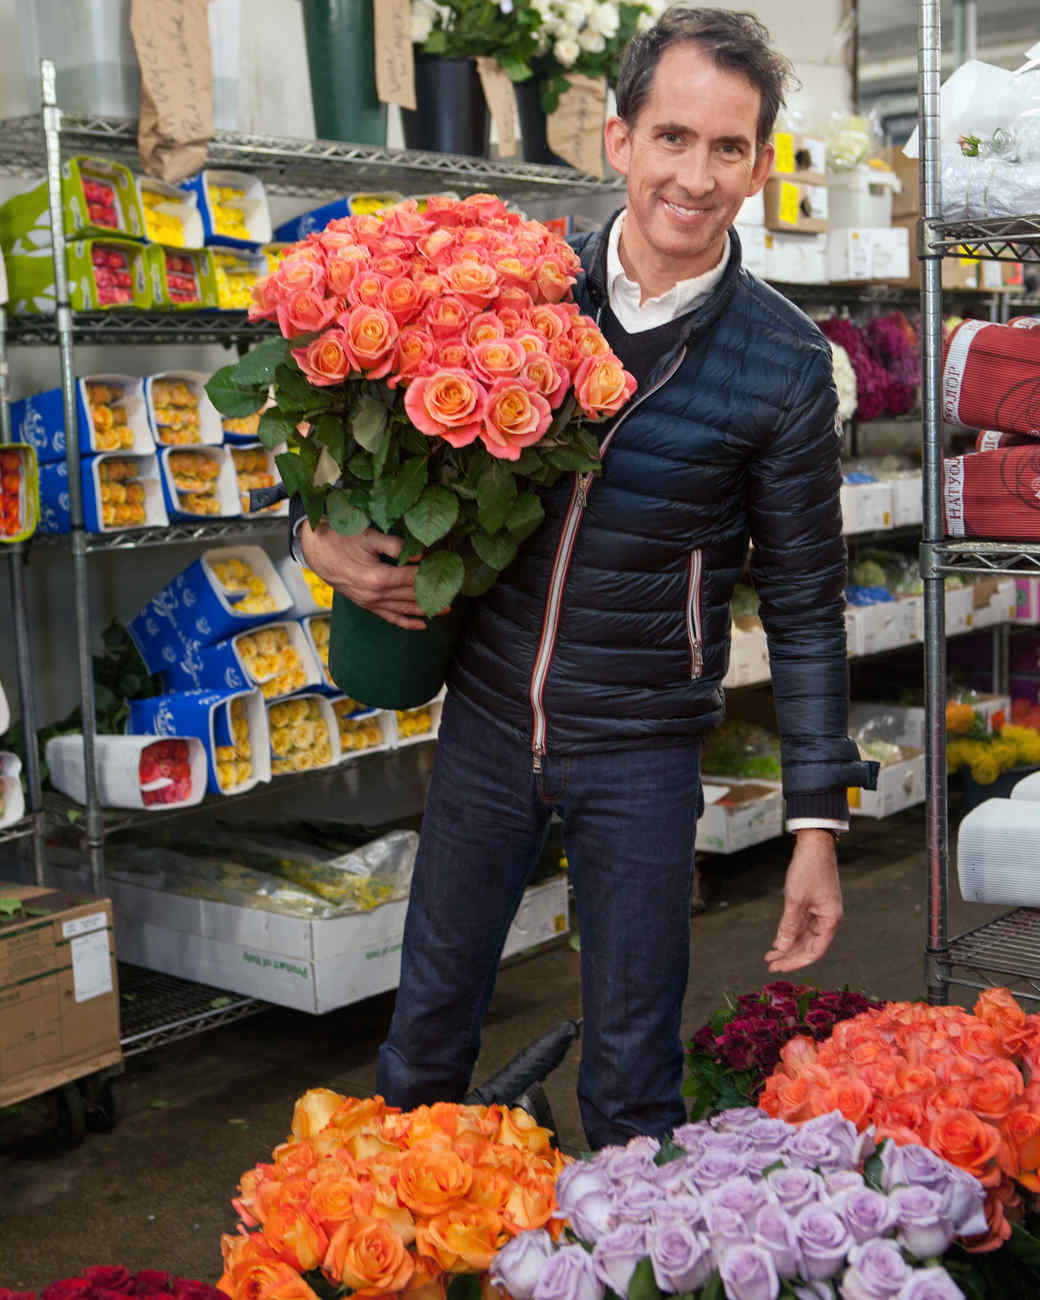 behind-the-scenes-flower-arrangement-7856-d111053.jpg